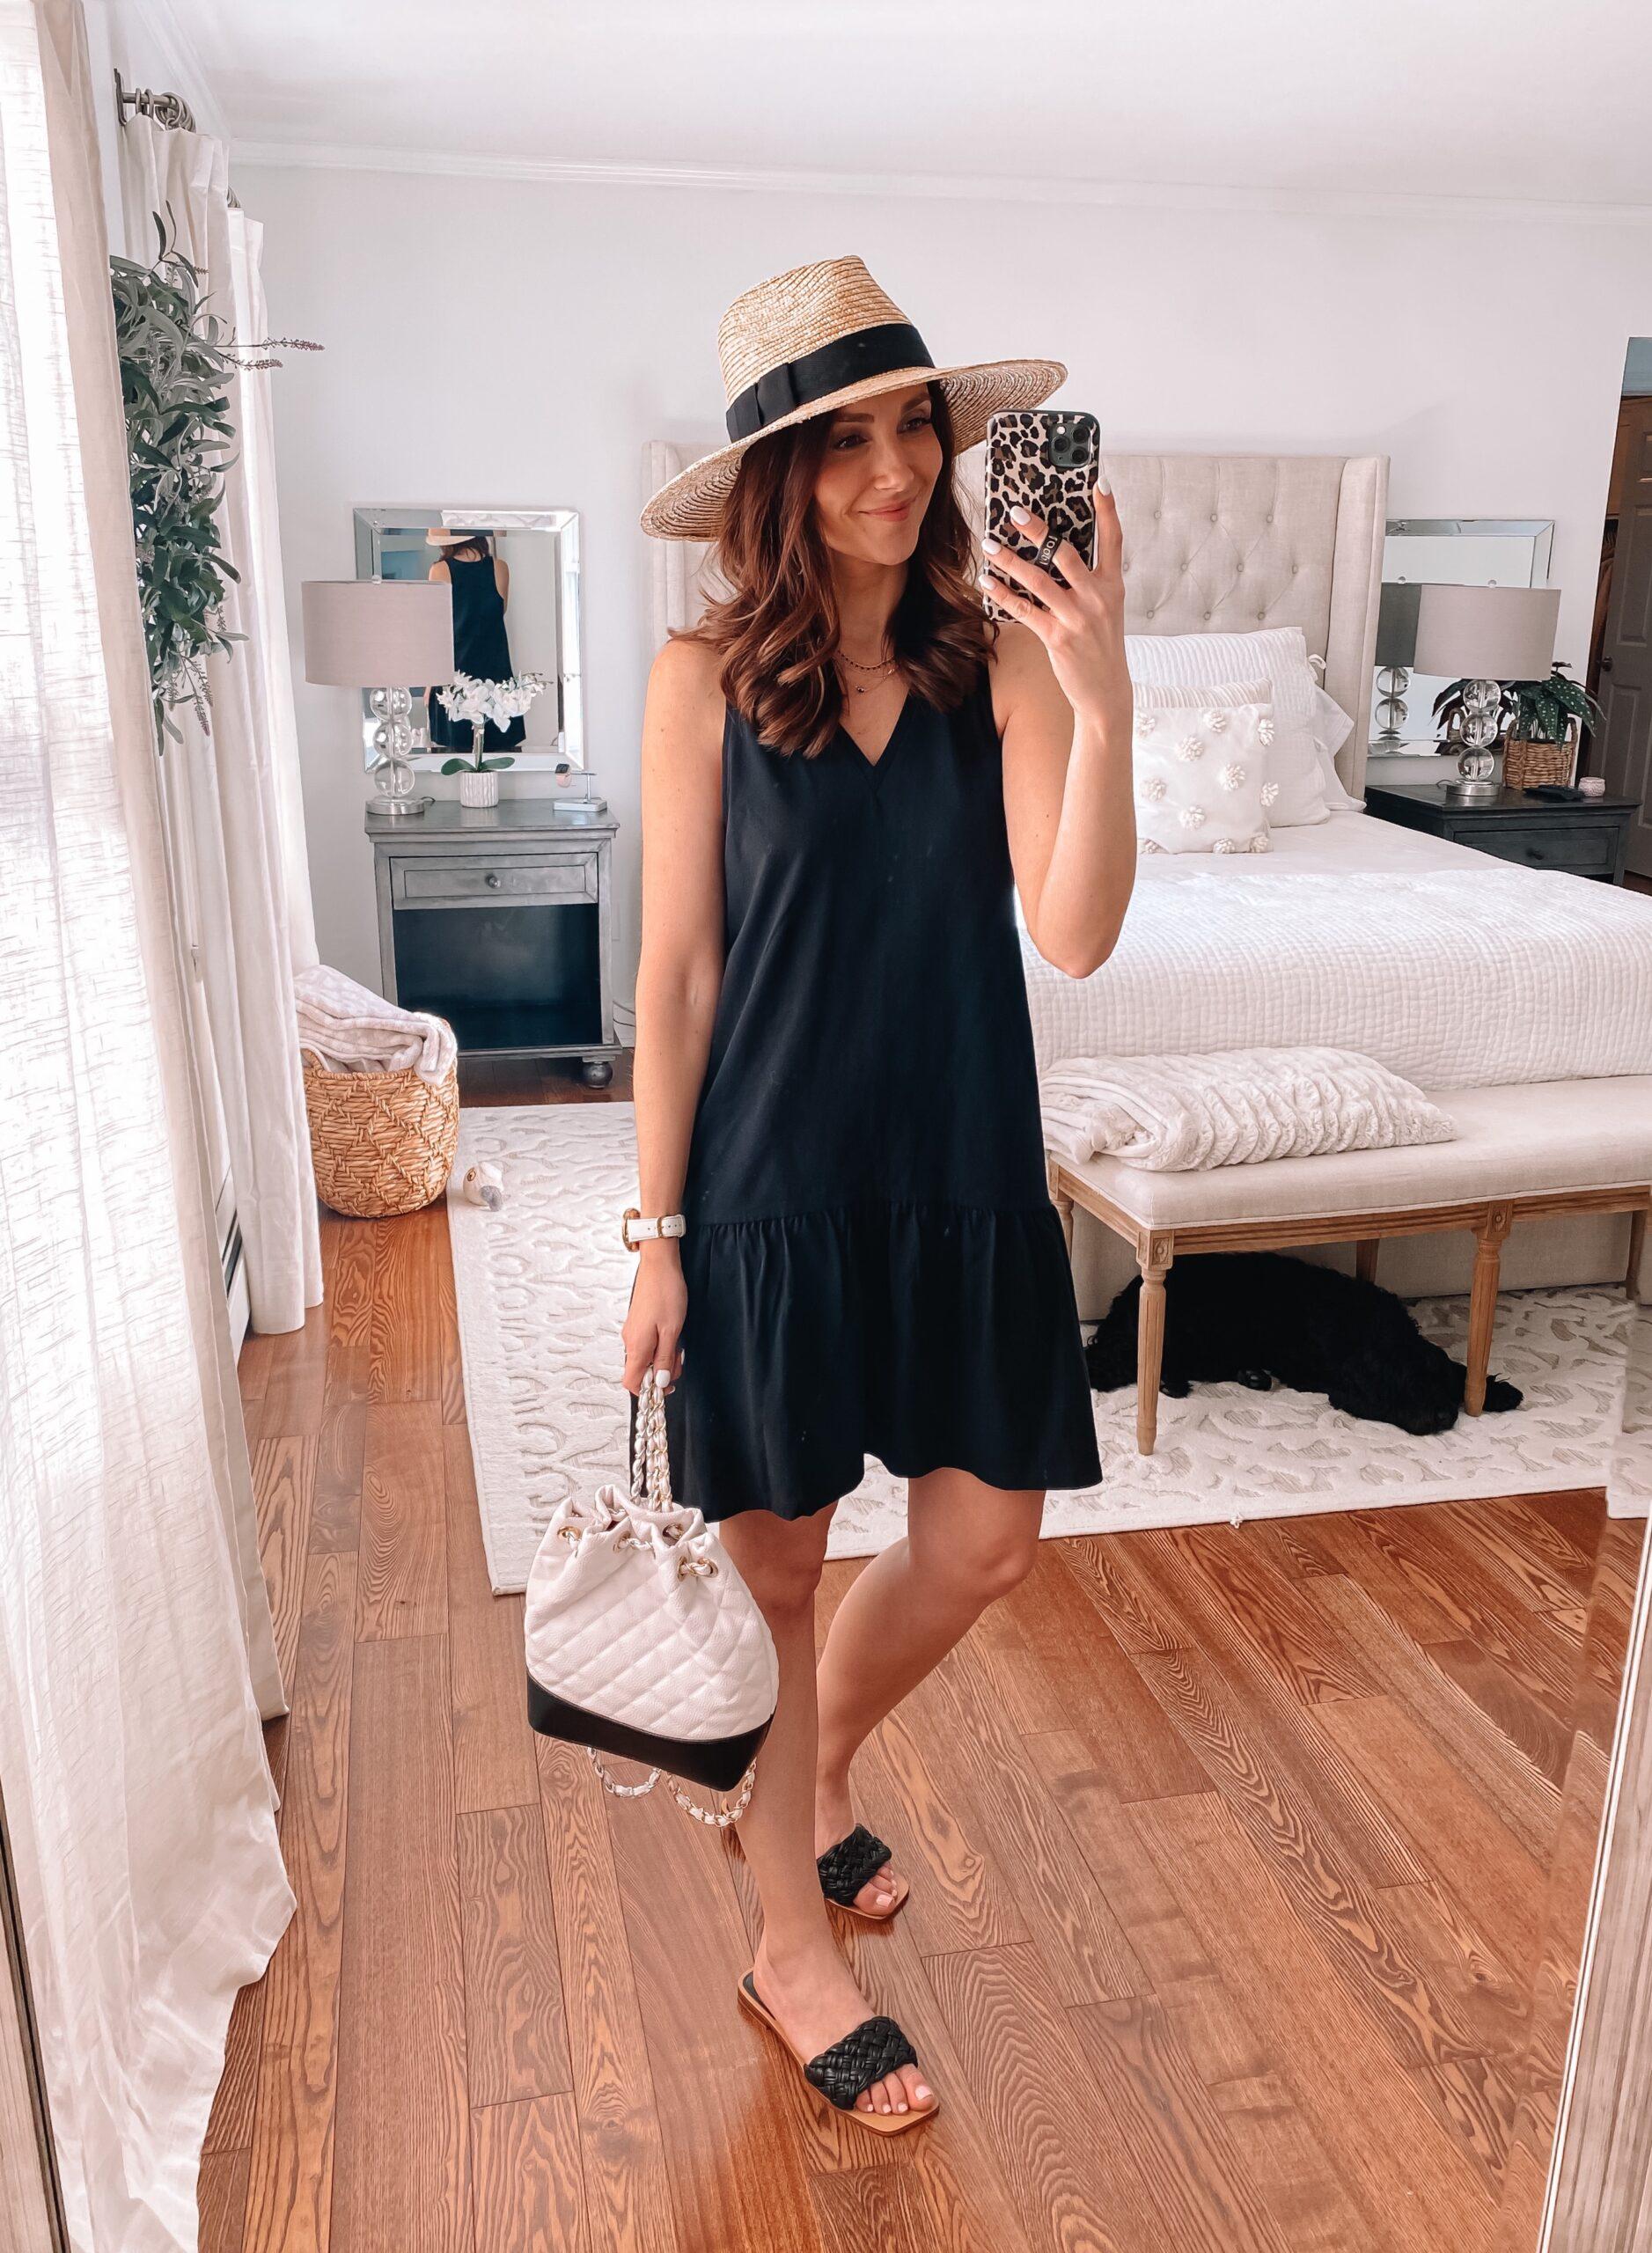 target black dress, target style